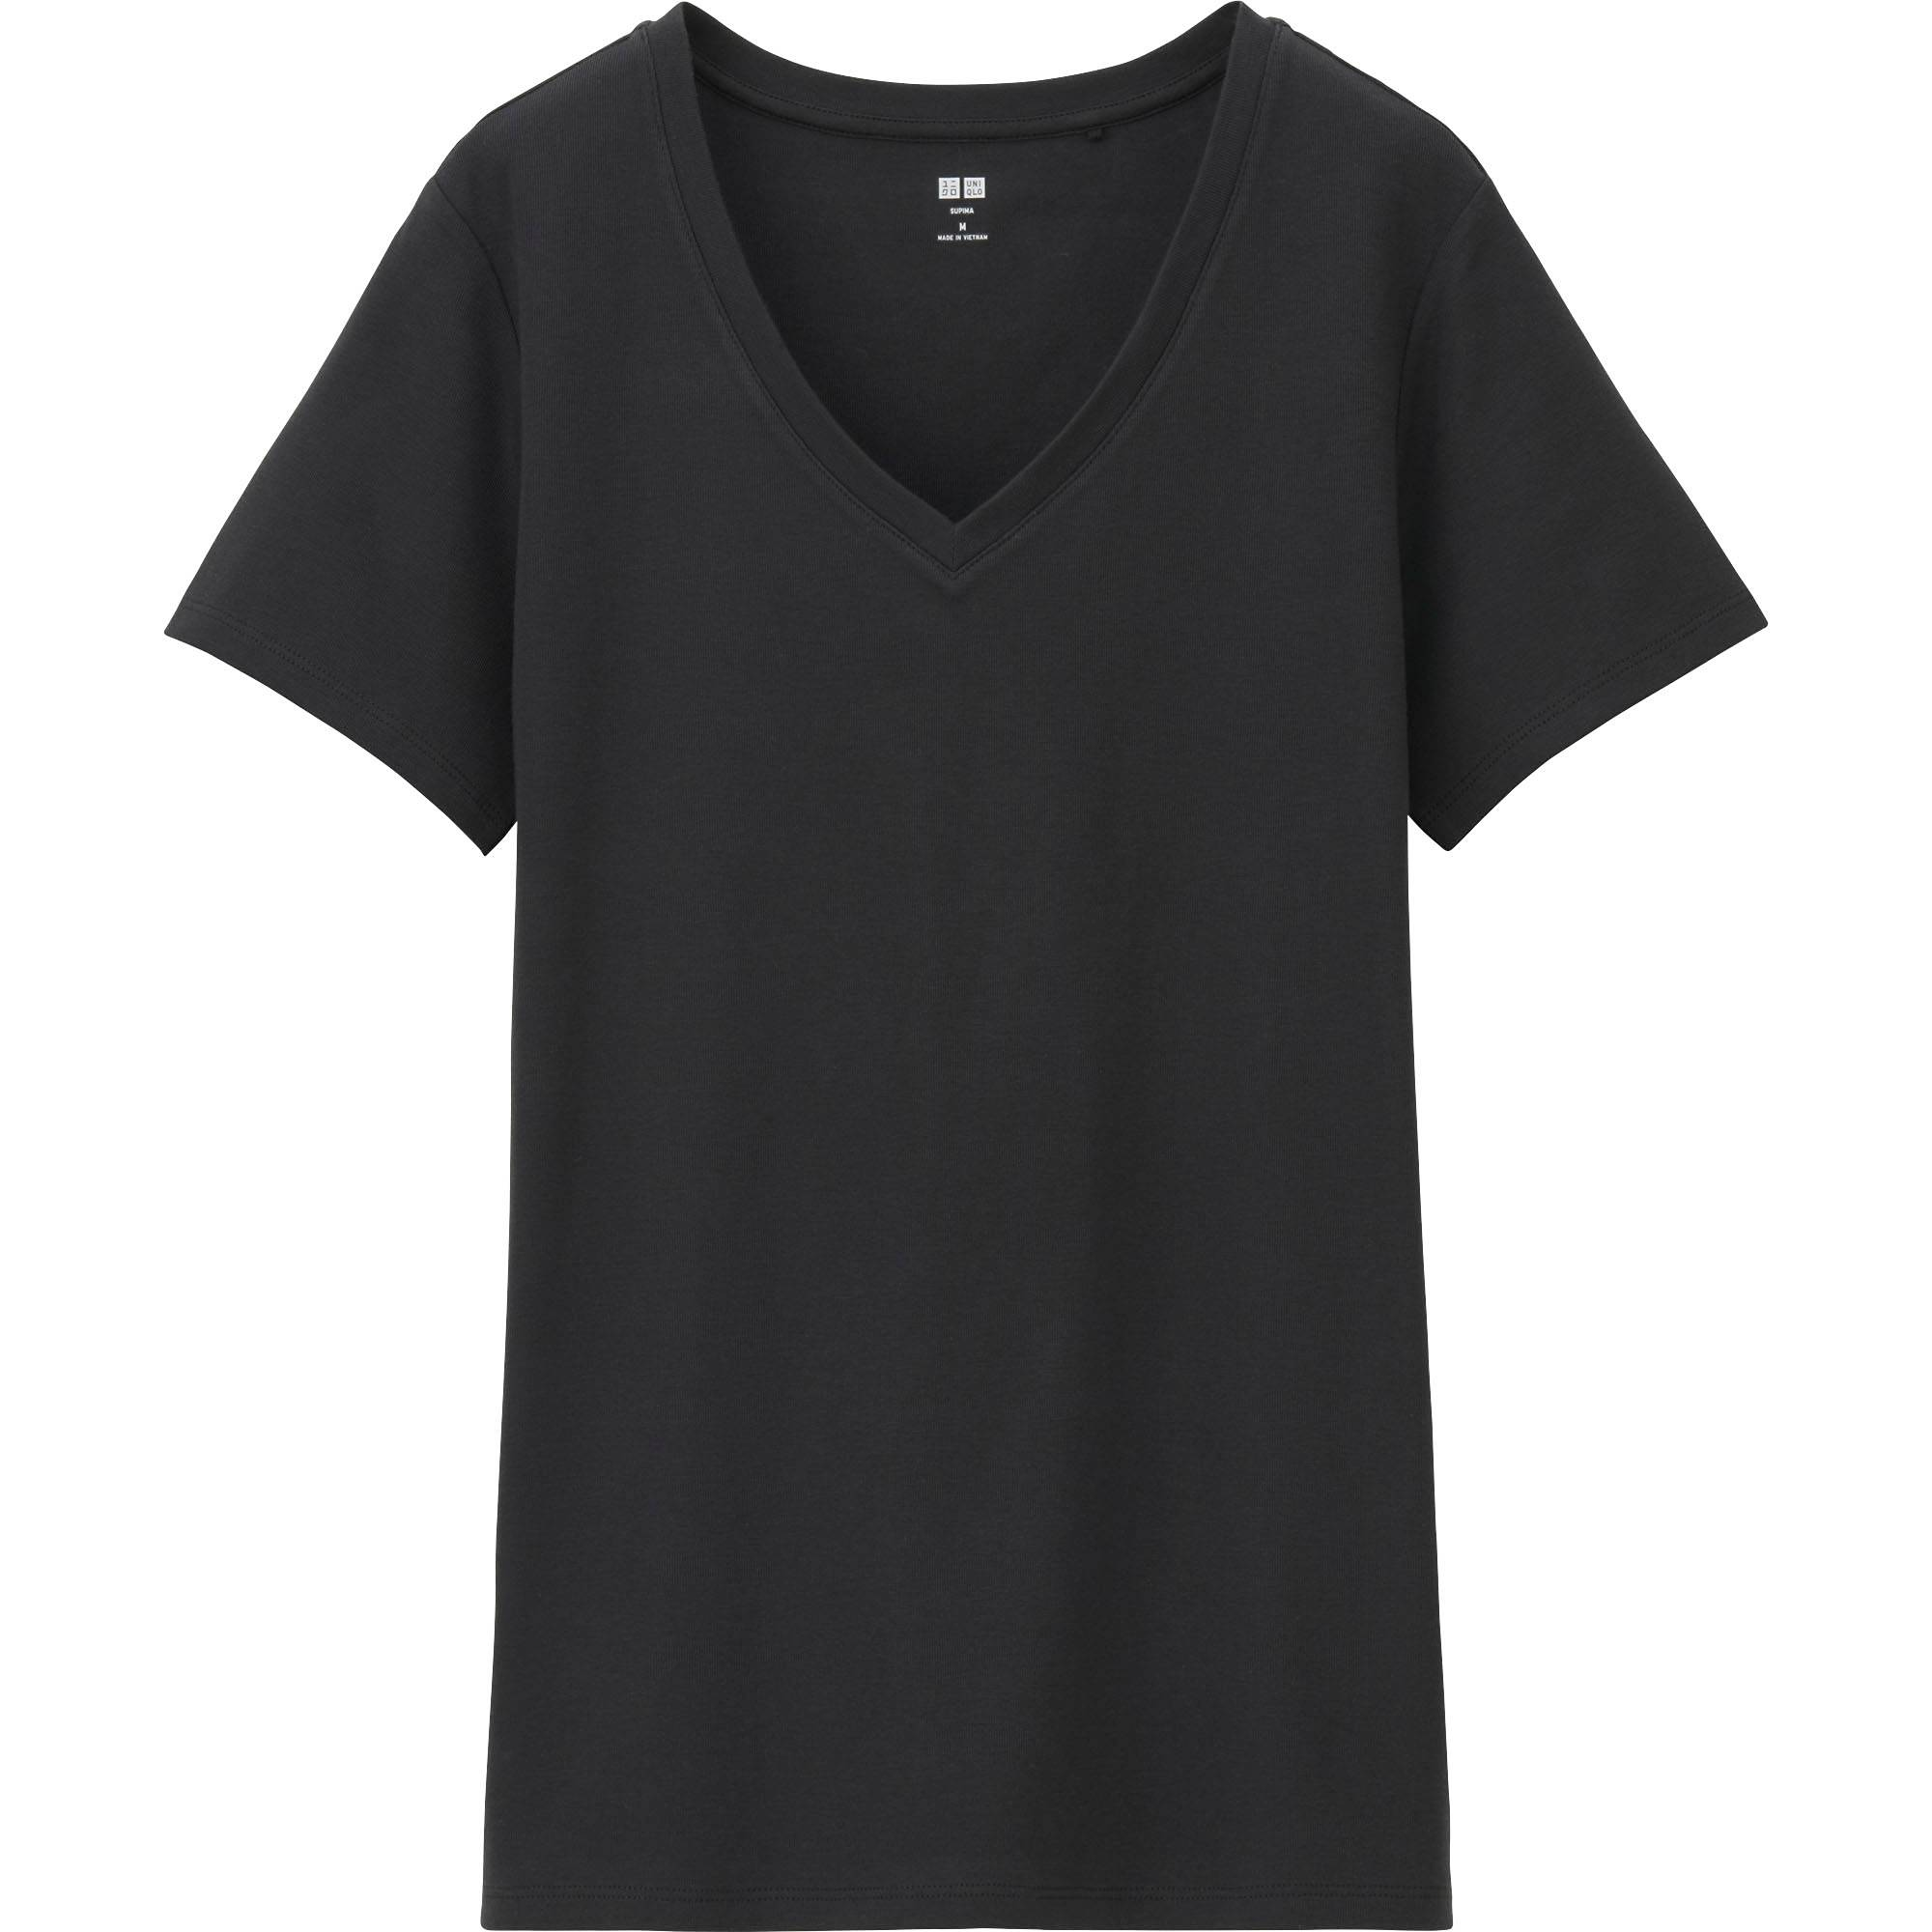 T shirt white black - Women Supima Cotton V Neck Short Sleeve T Shirt White